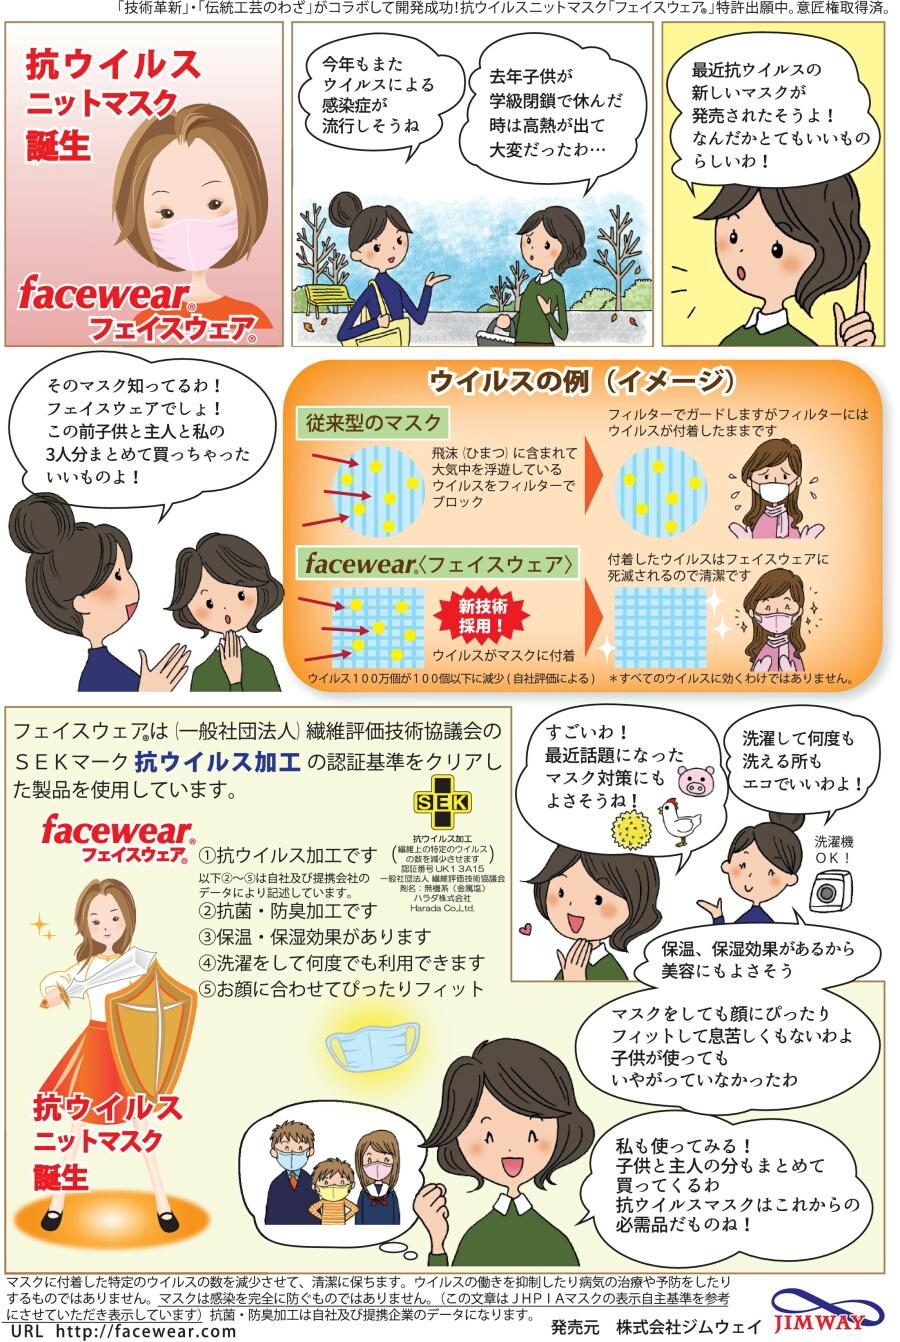 facewear説明マンガ